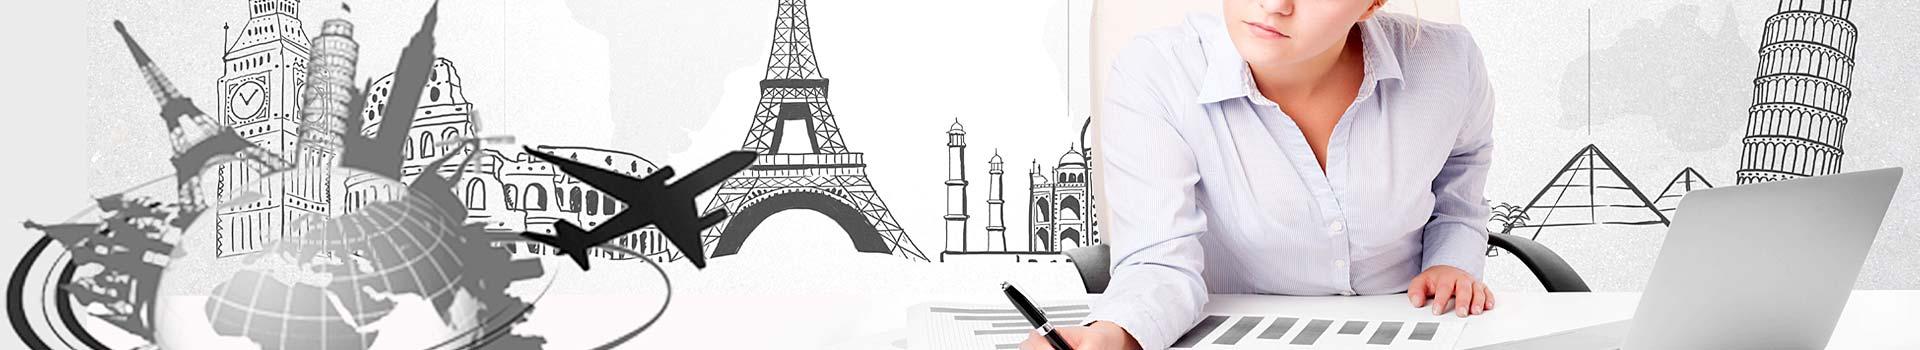 best-online-travel-apps